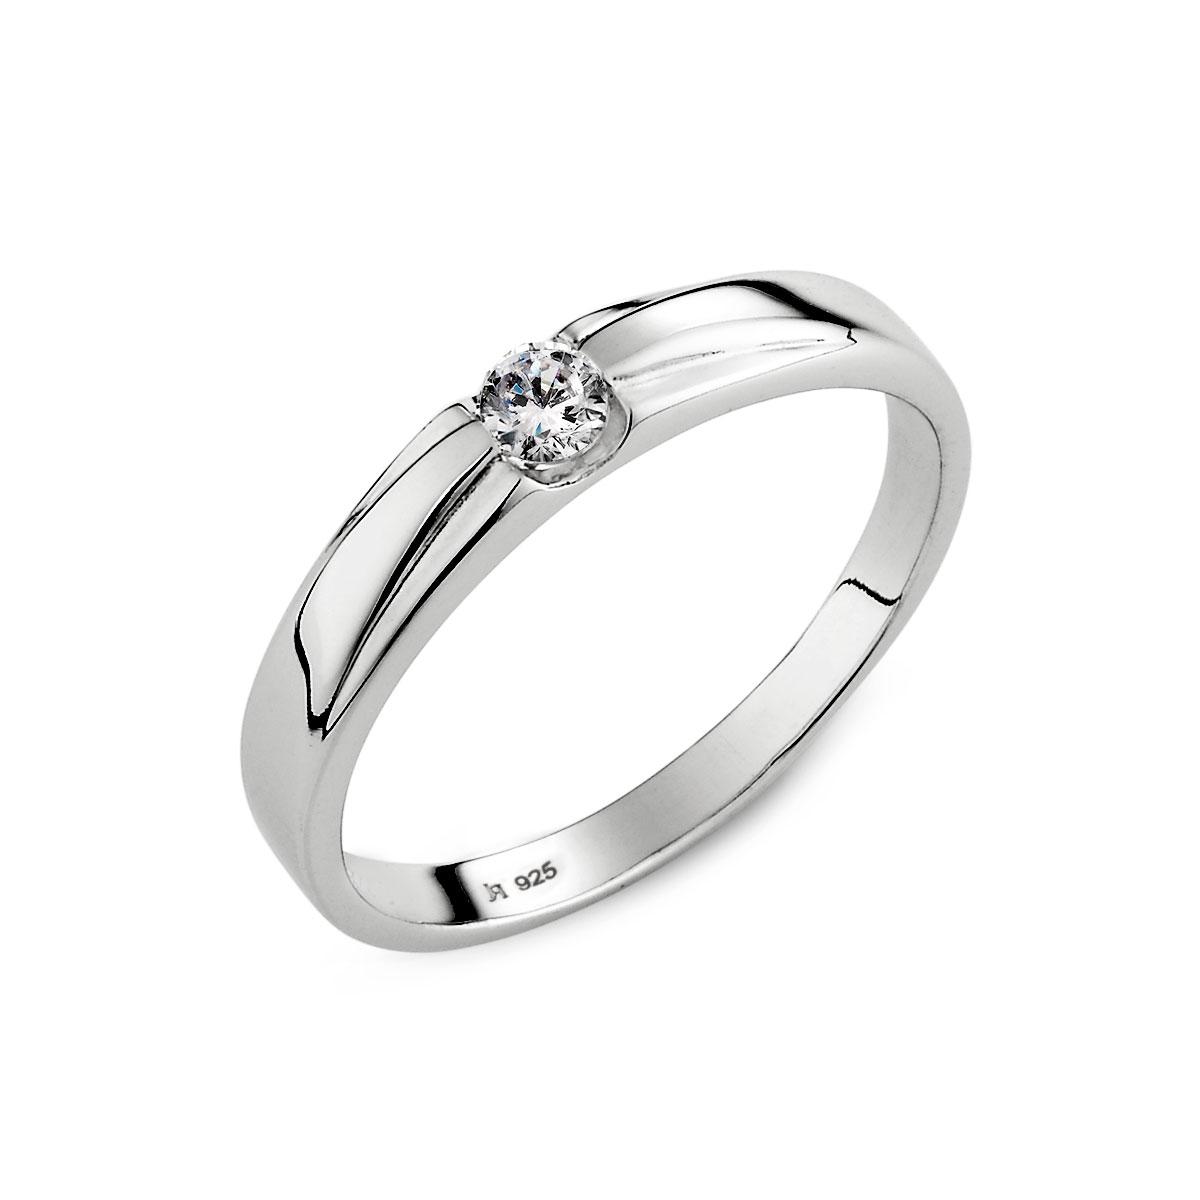 KSW271 永恆之星單鑽戒指